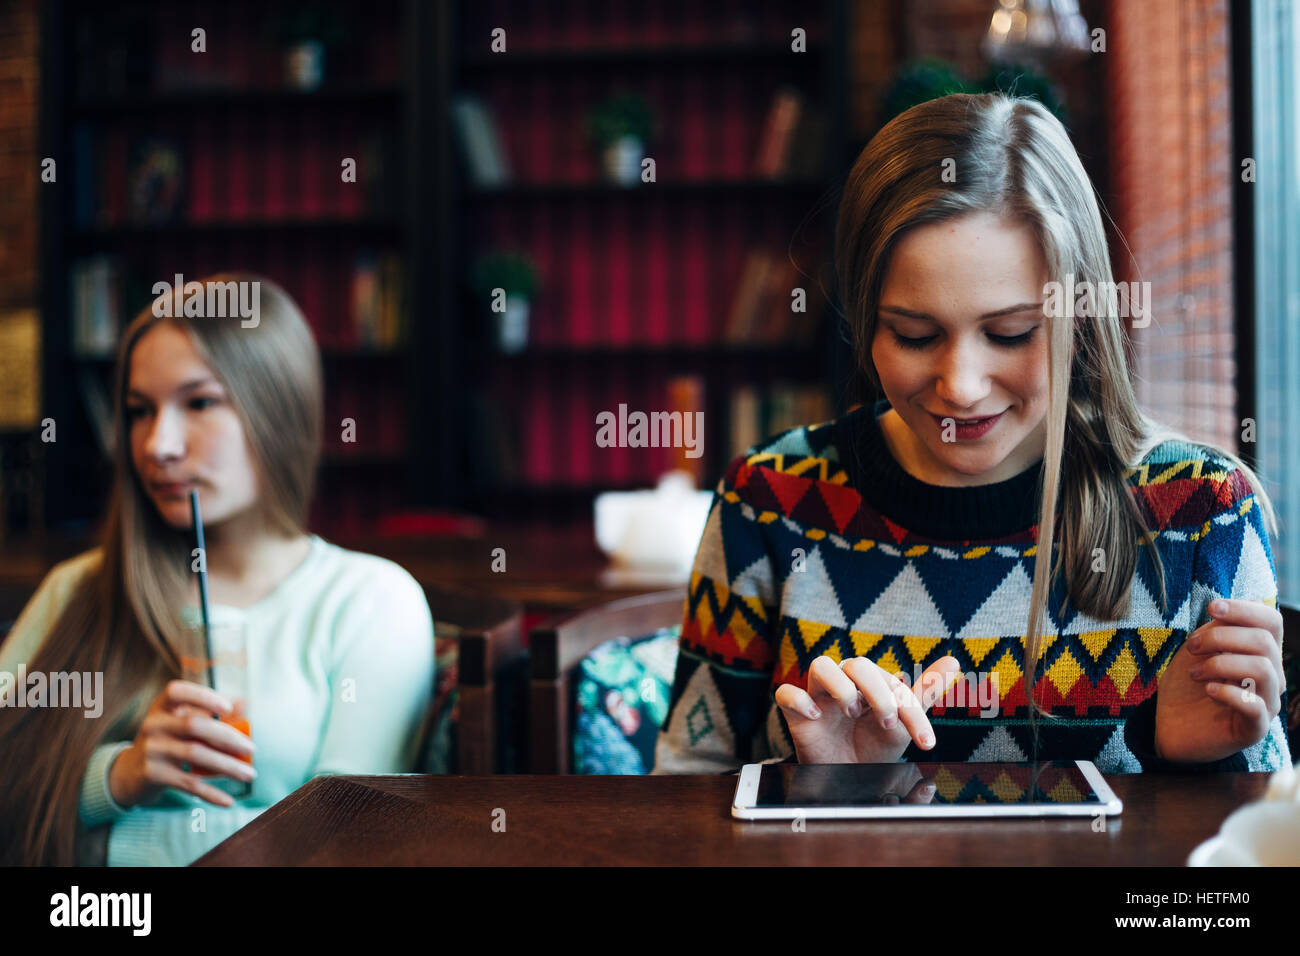 Amigas comunicarse en un café Imagen De Stock